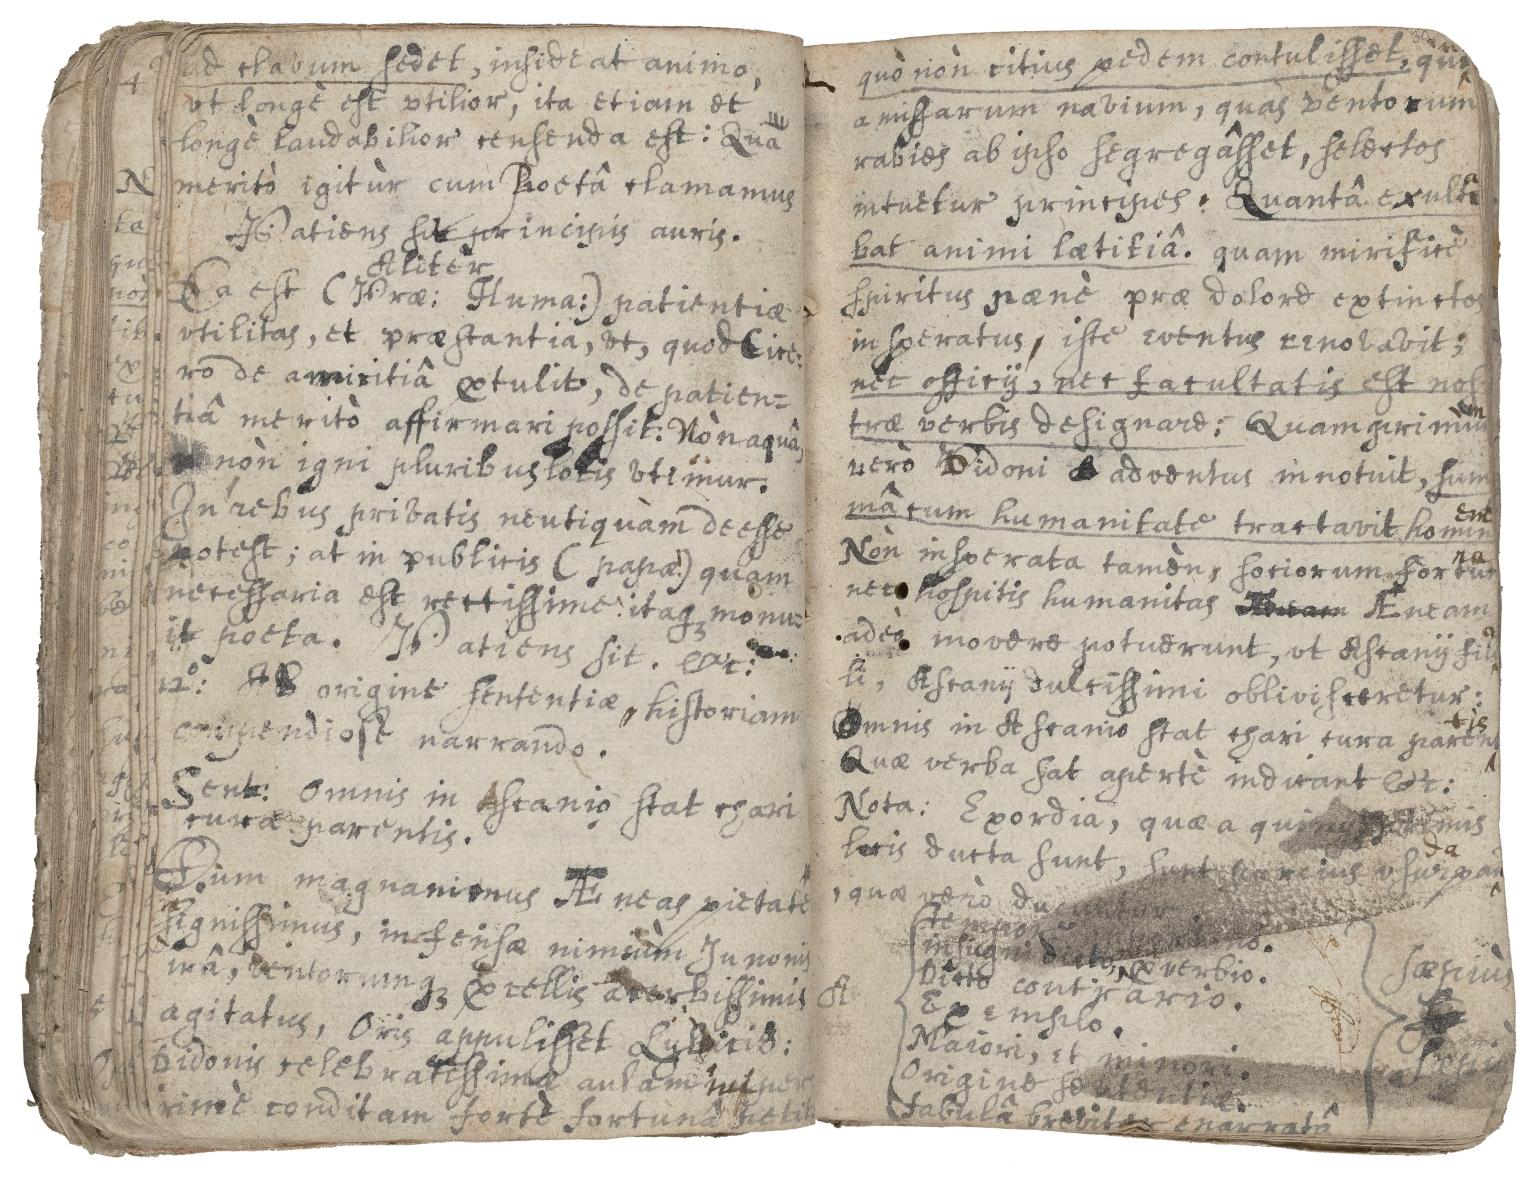 Robert Pendarves his booke amen, written by me ... Anno Domini 1652 [manuscript].